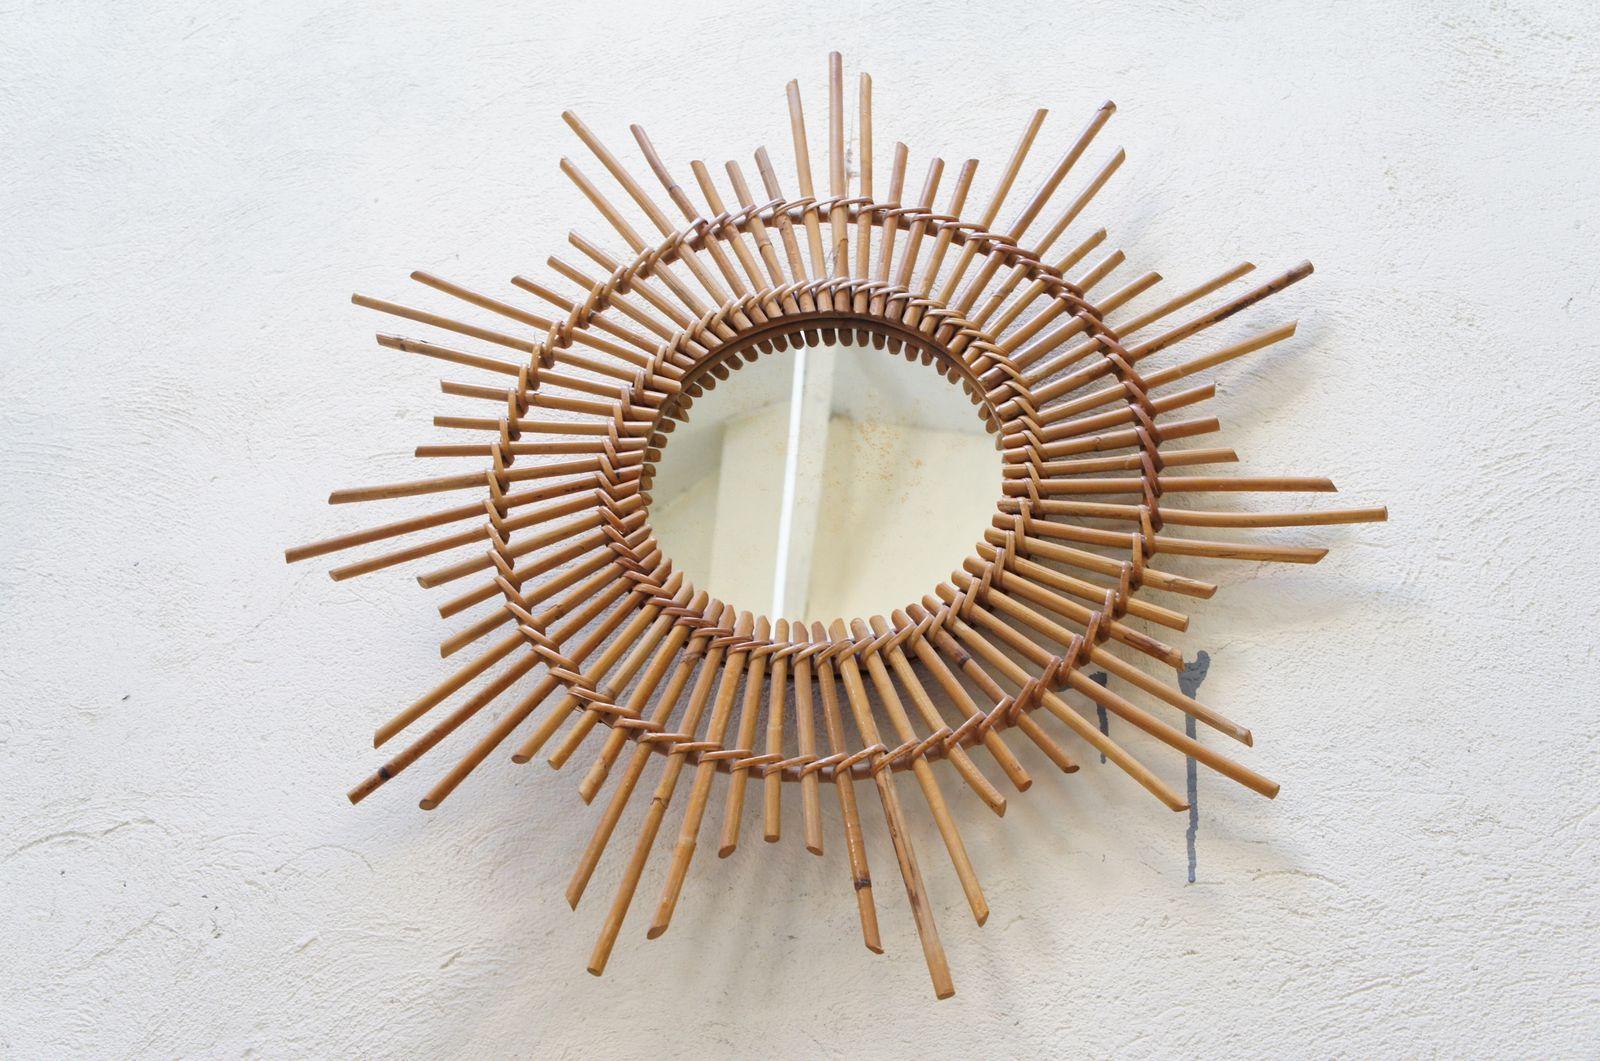 Vendu miroir soleil vintage bambou rotin il de sorci re for Miroir bambou